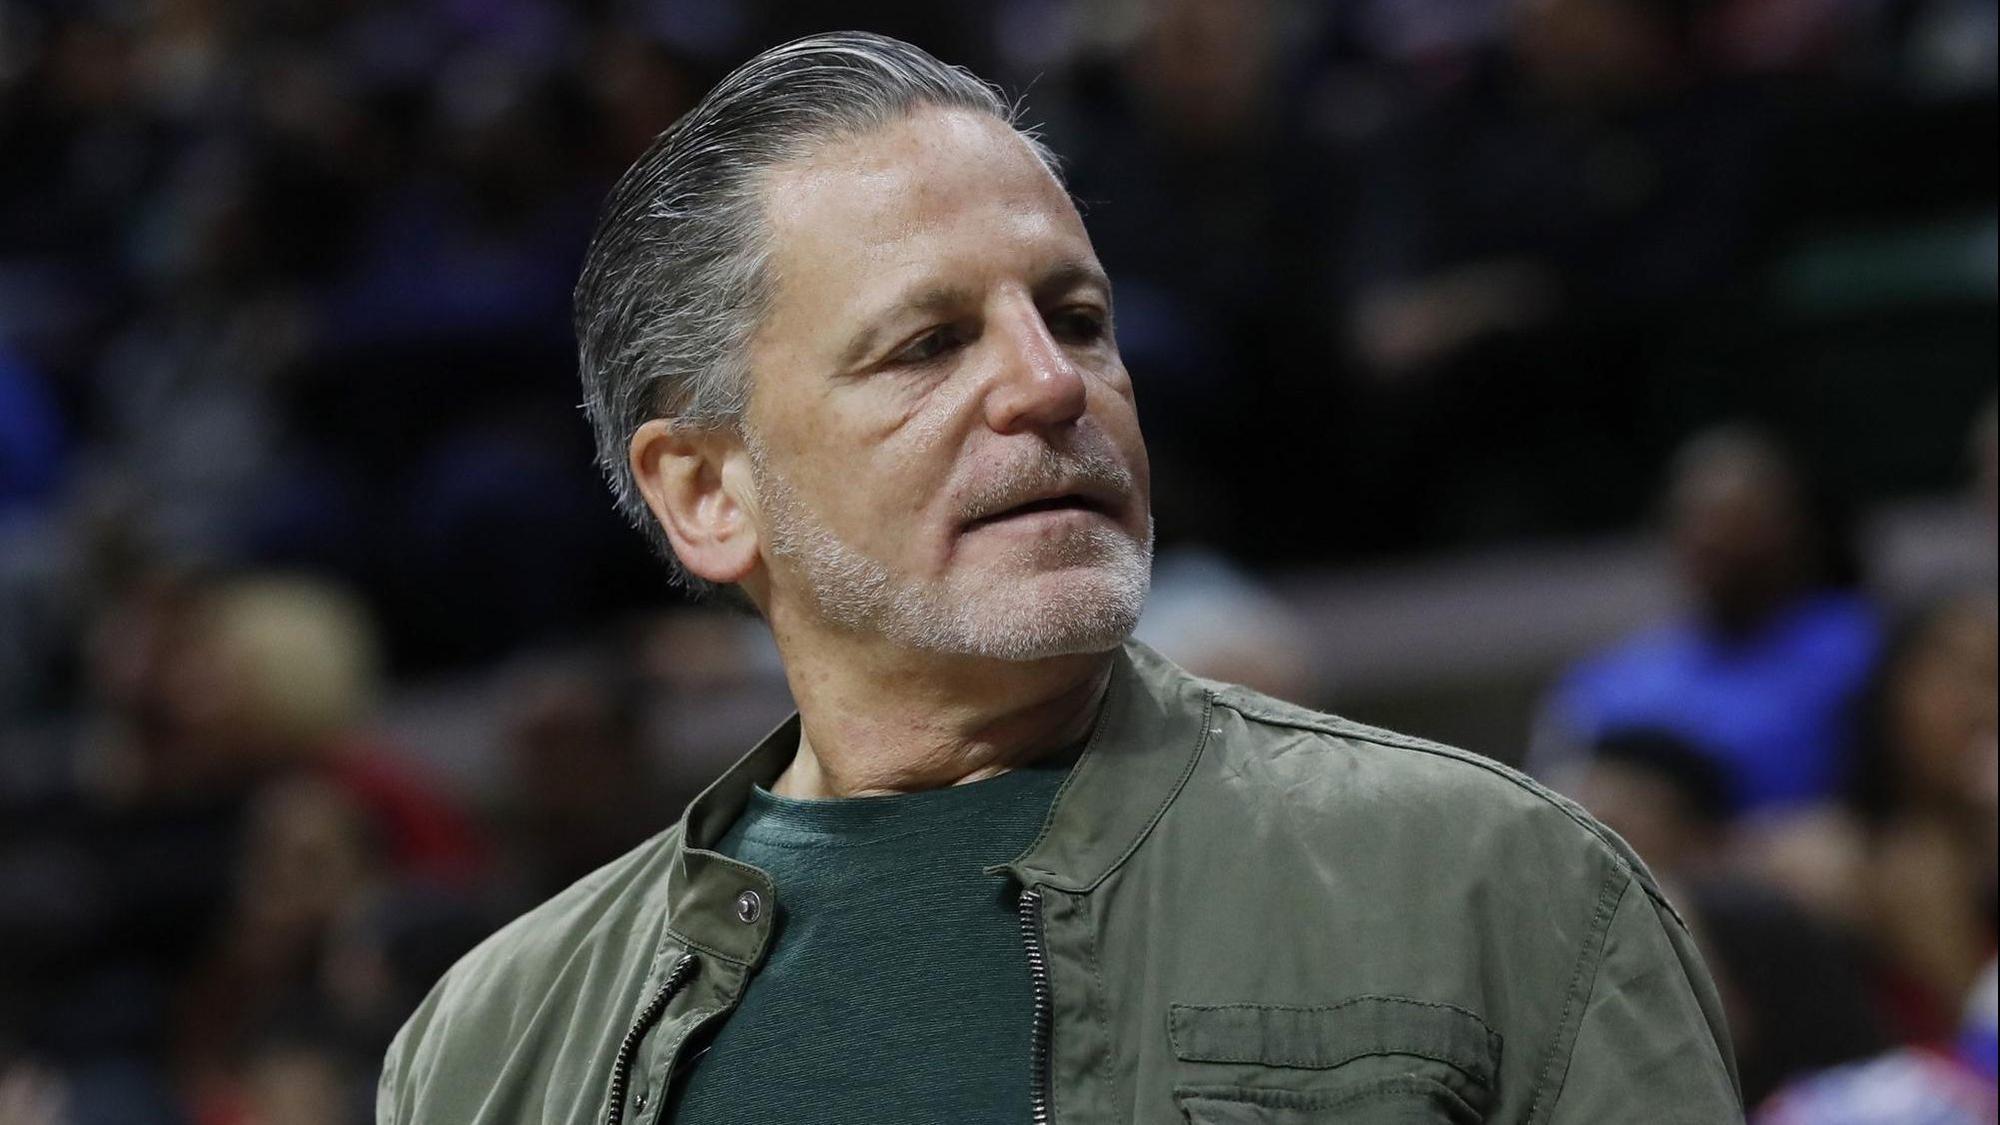 Cavaliers owner Dan Gilbert recovering after suffering stroke symptoms